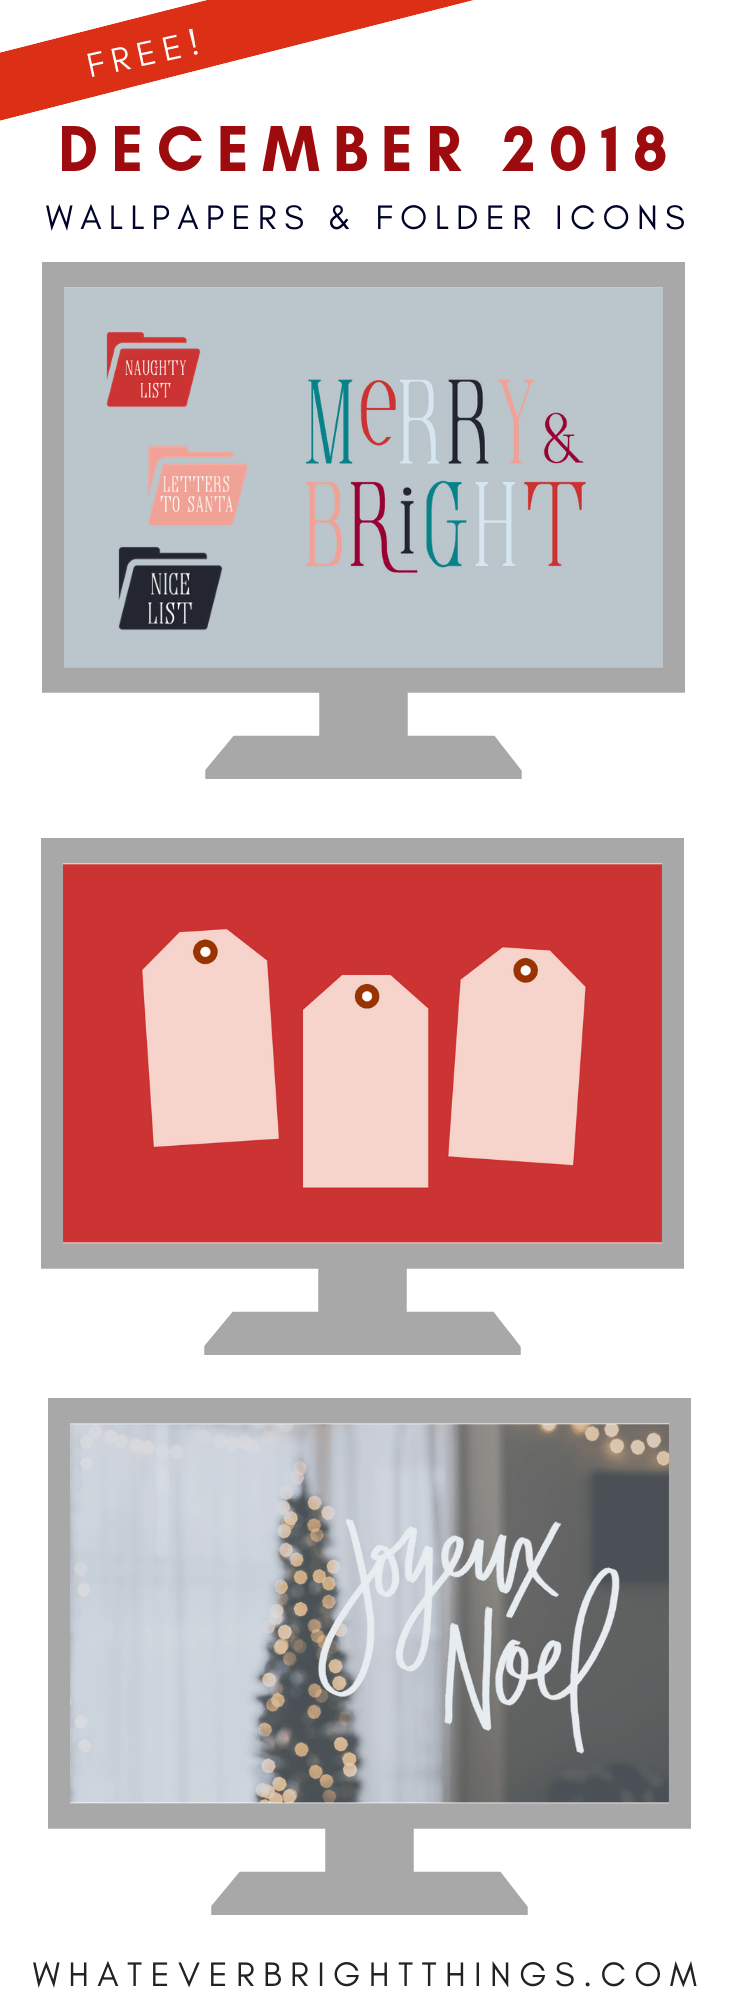 December 2018 Wallpapers & Folder Icons Desktop